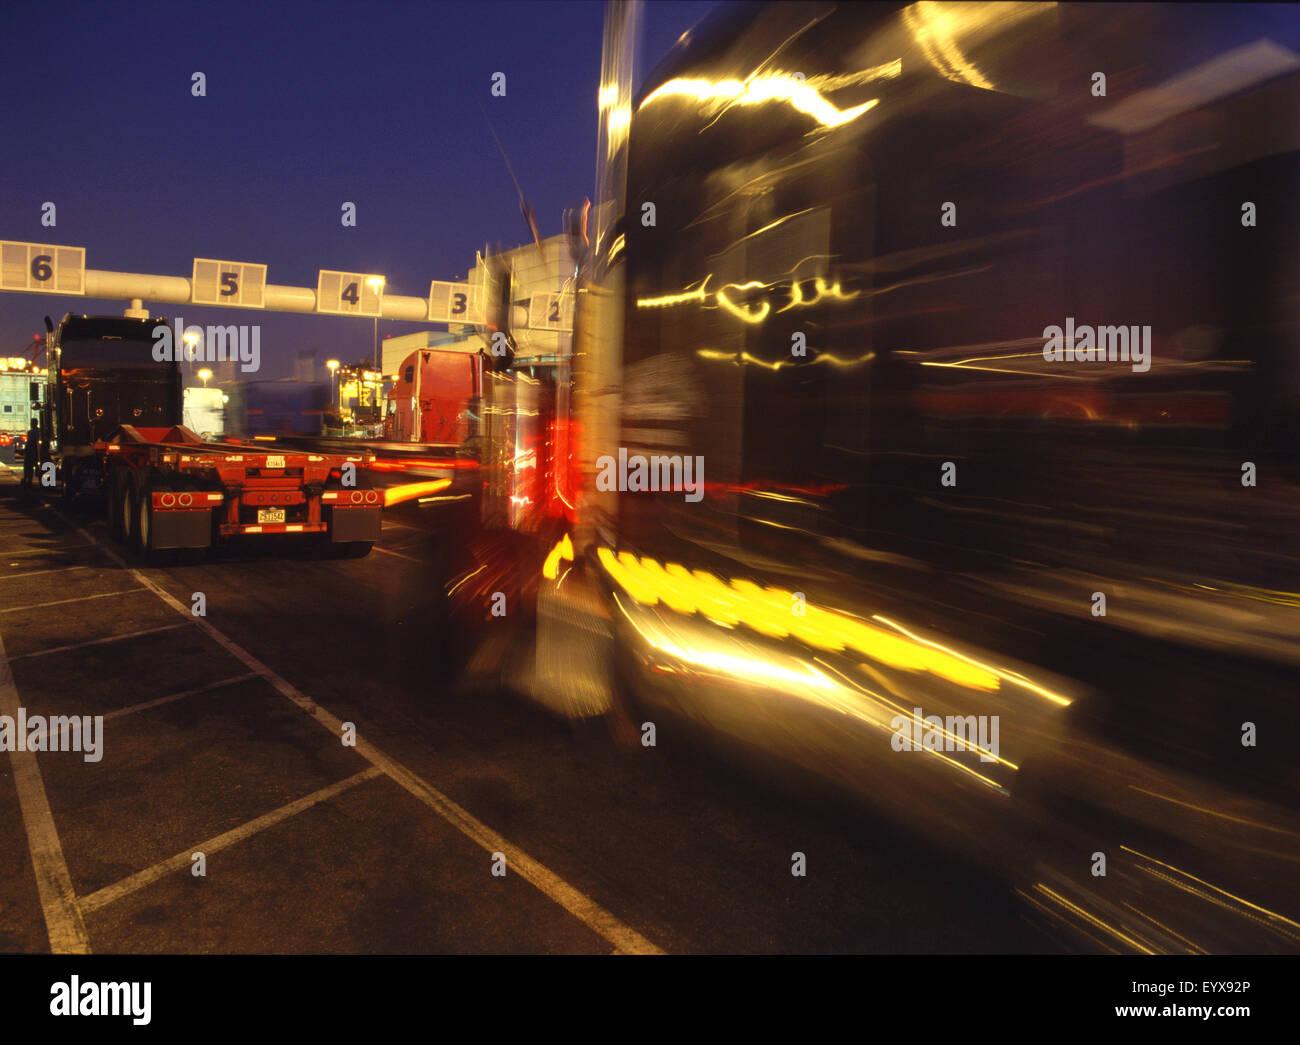 Trucks at weighing station - Stock Image